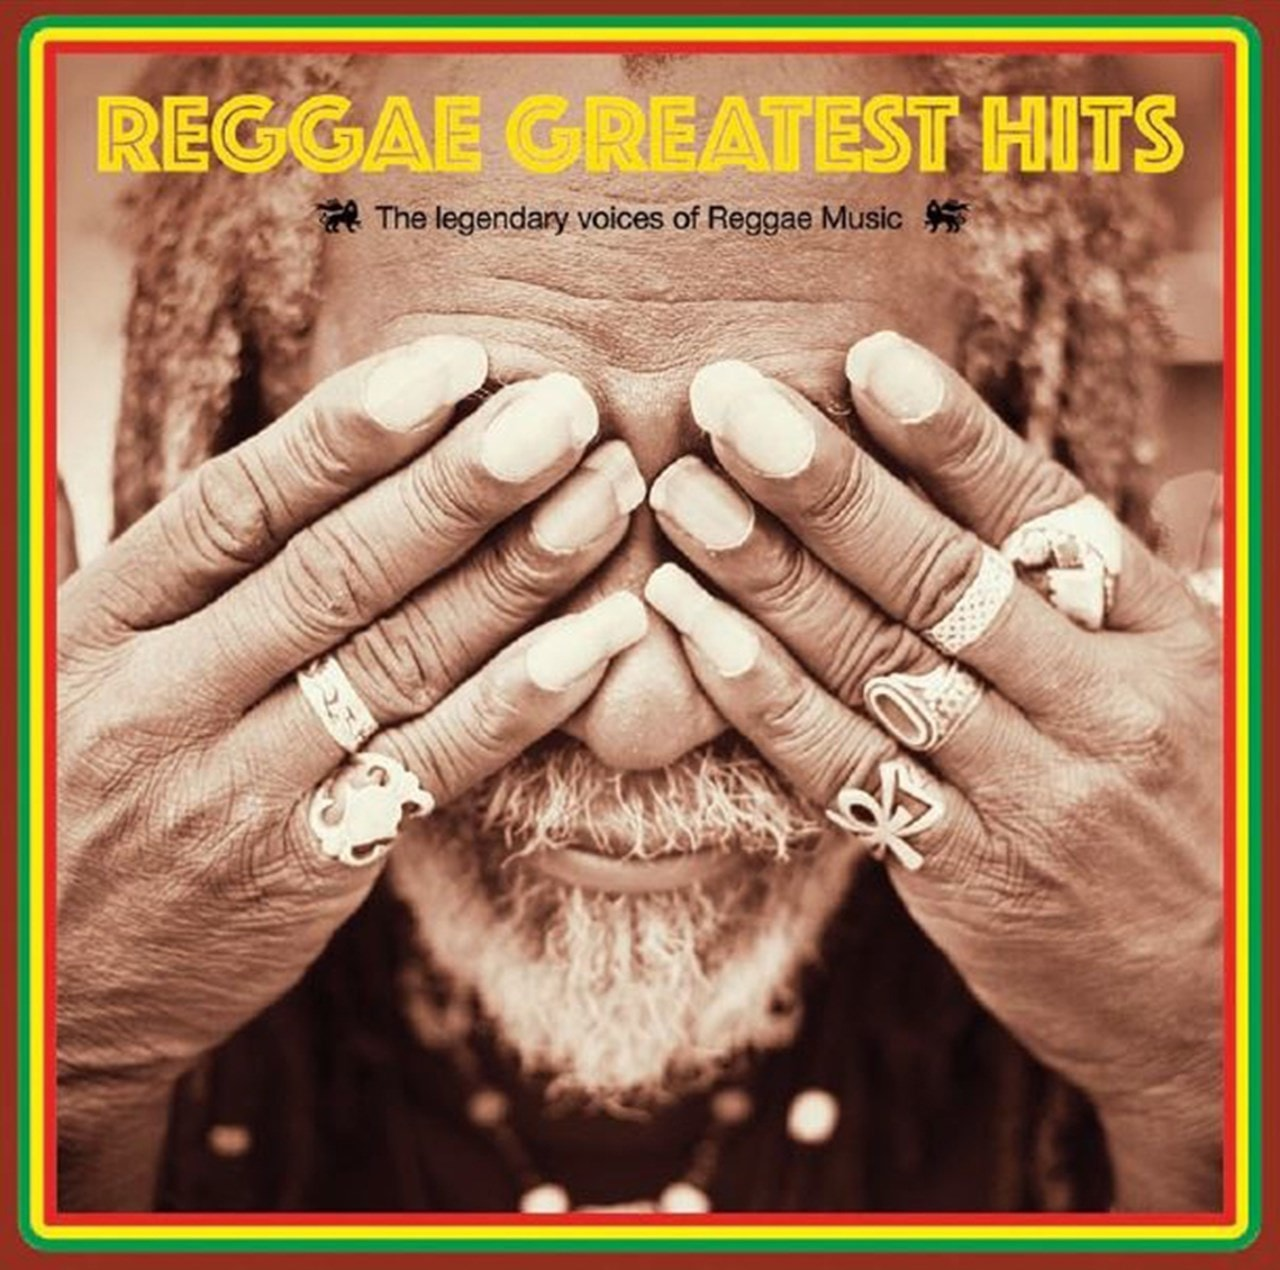 Reggae Greatest Hits: The Legendary Voices of Reggae Music - 1